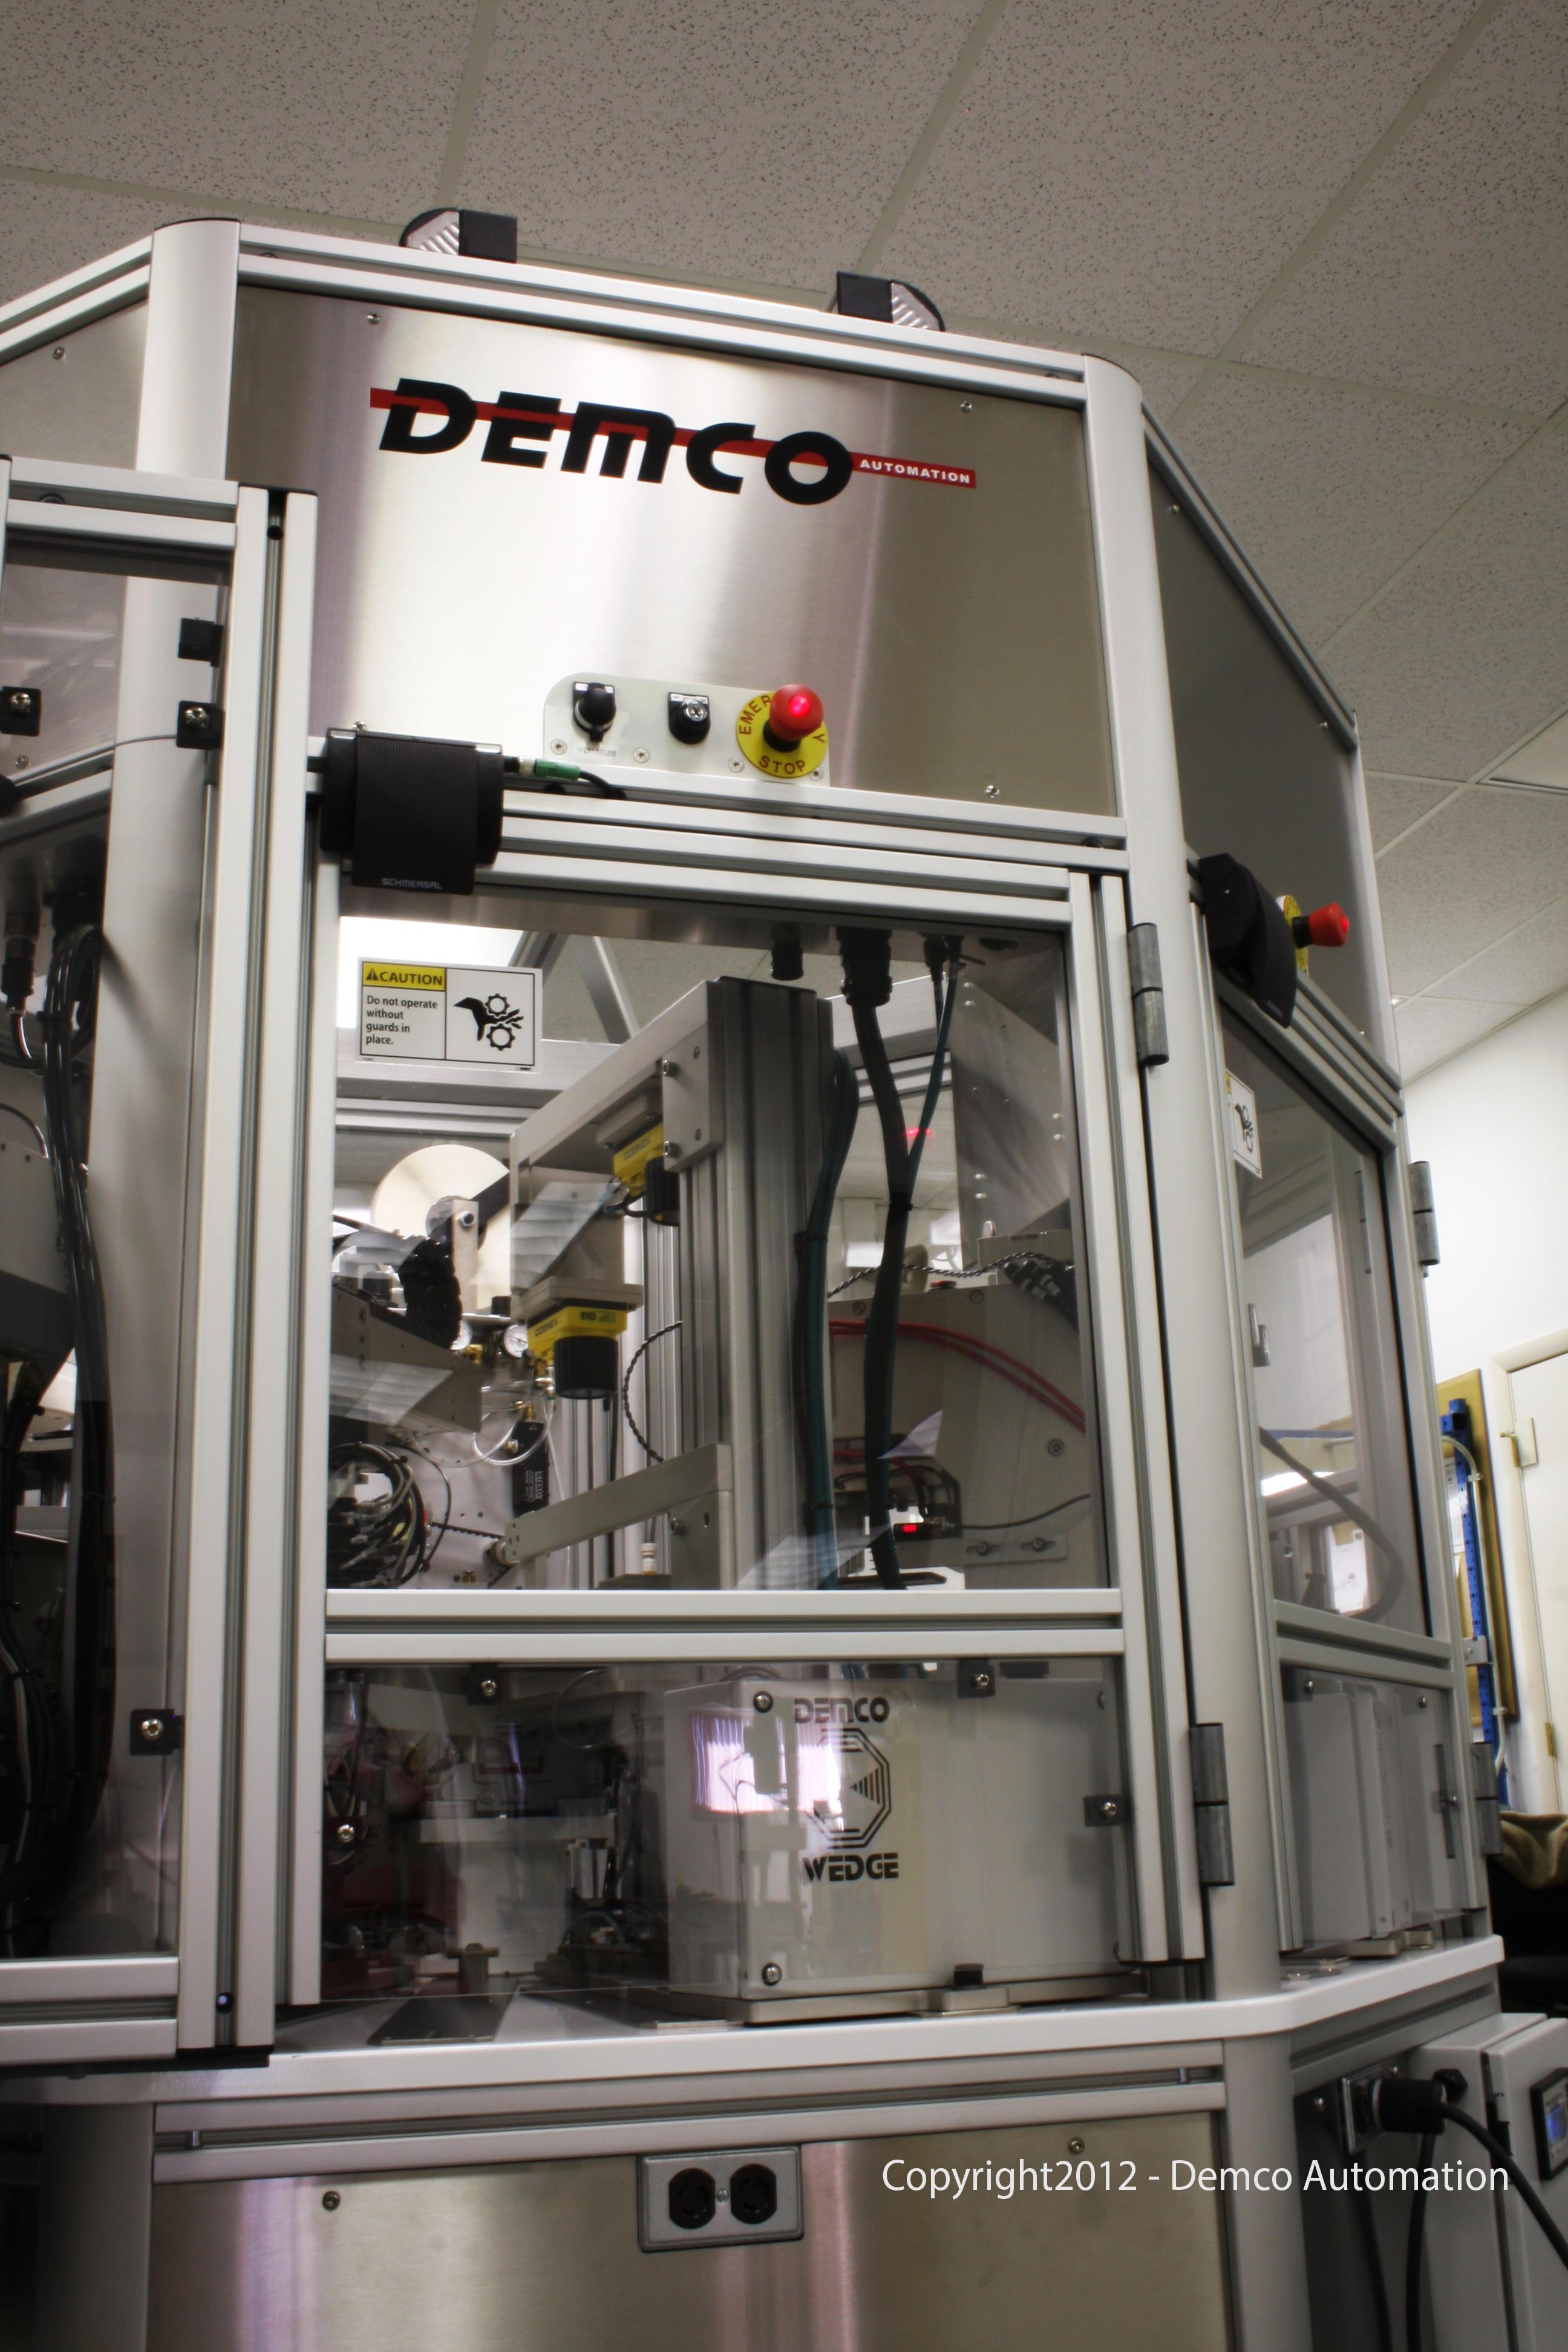 Demco Automation image 0